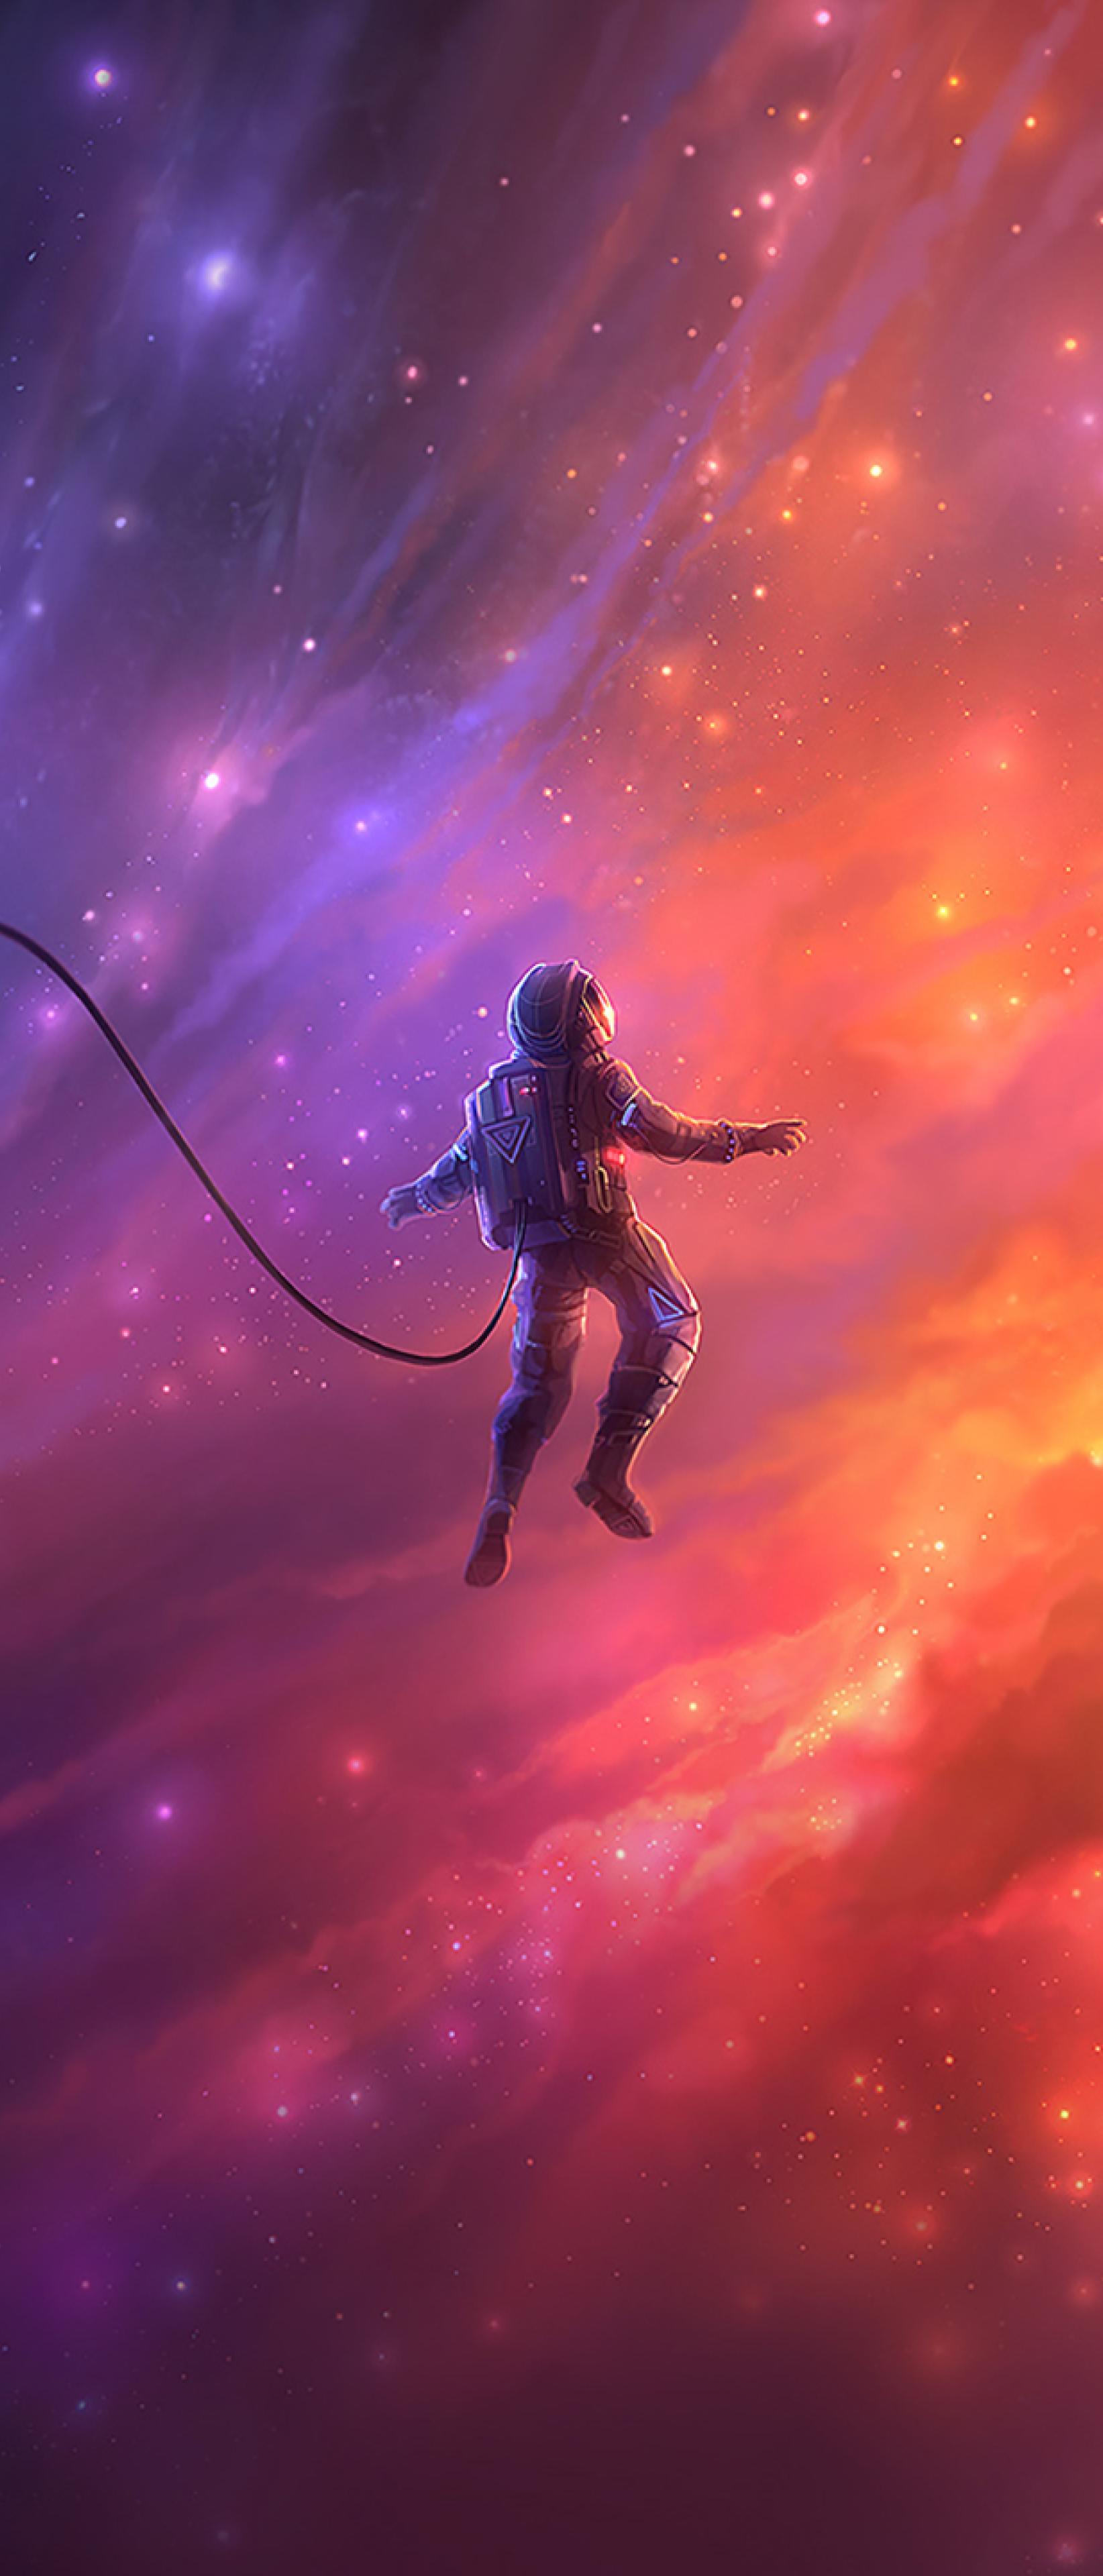 astronaut in